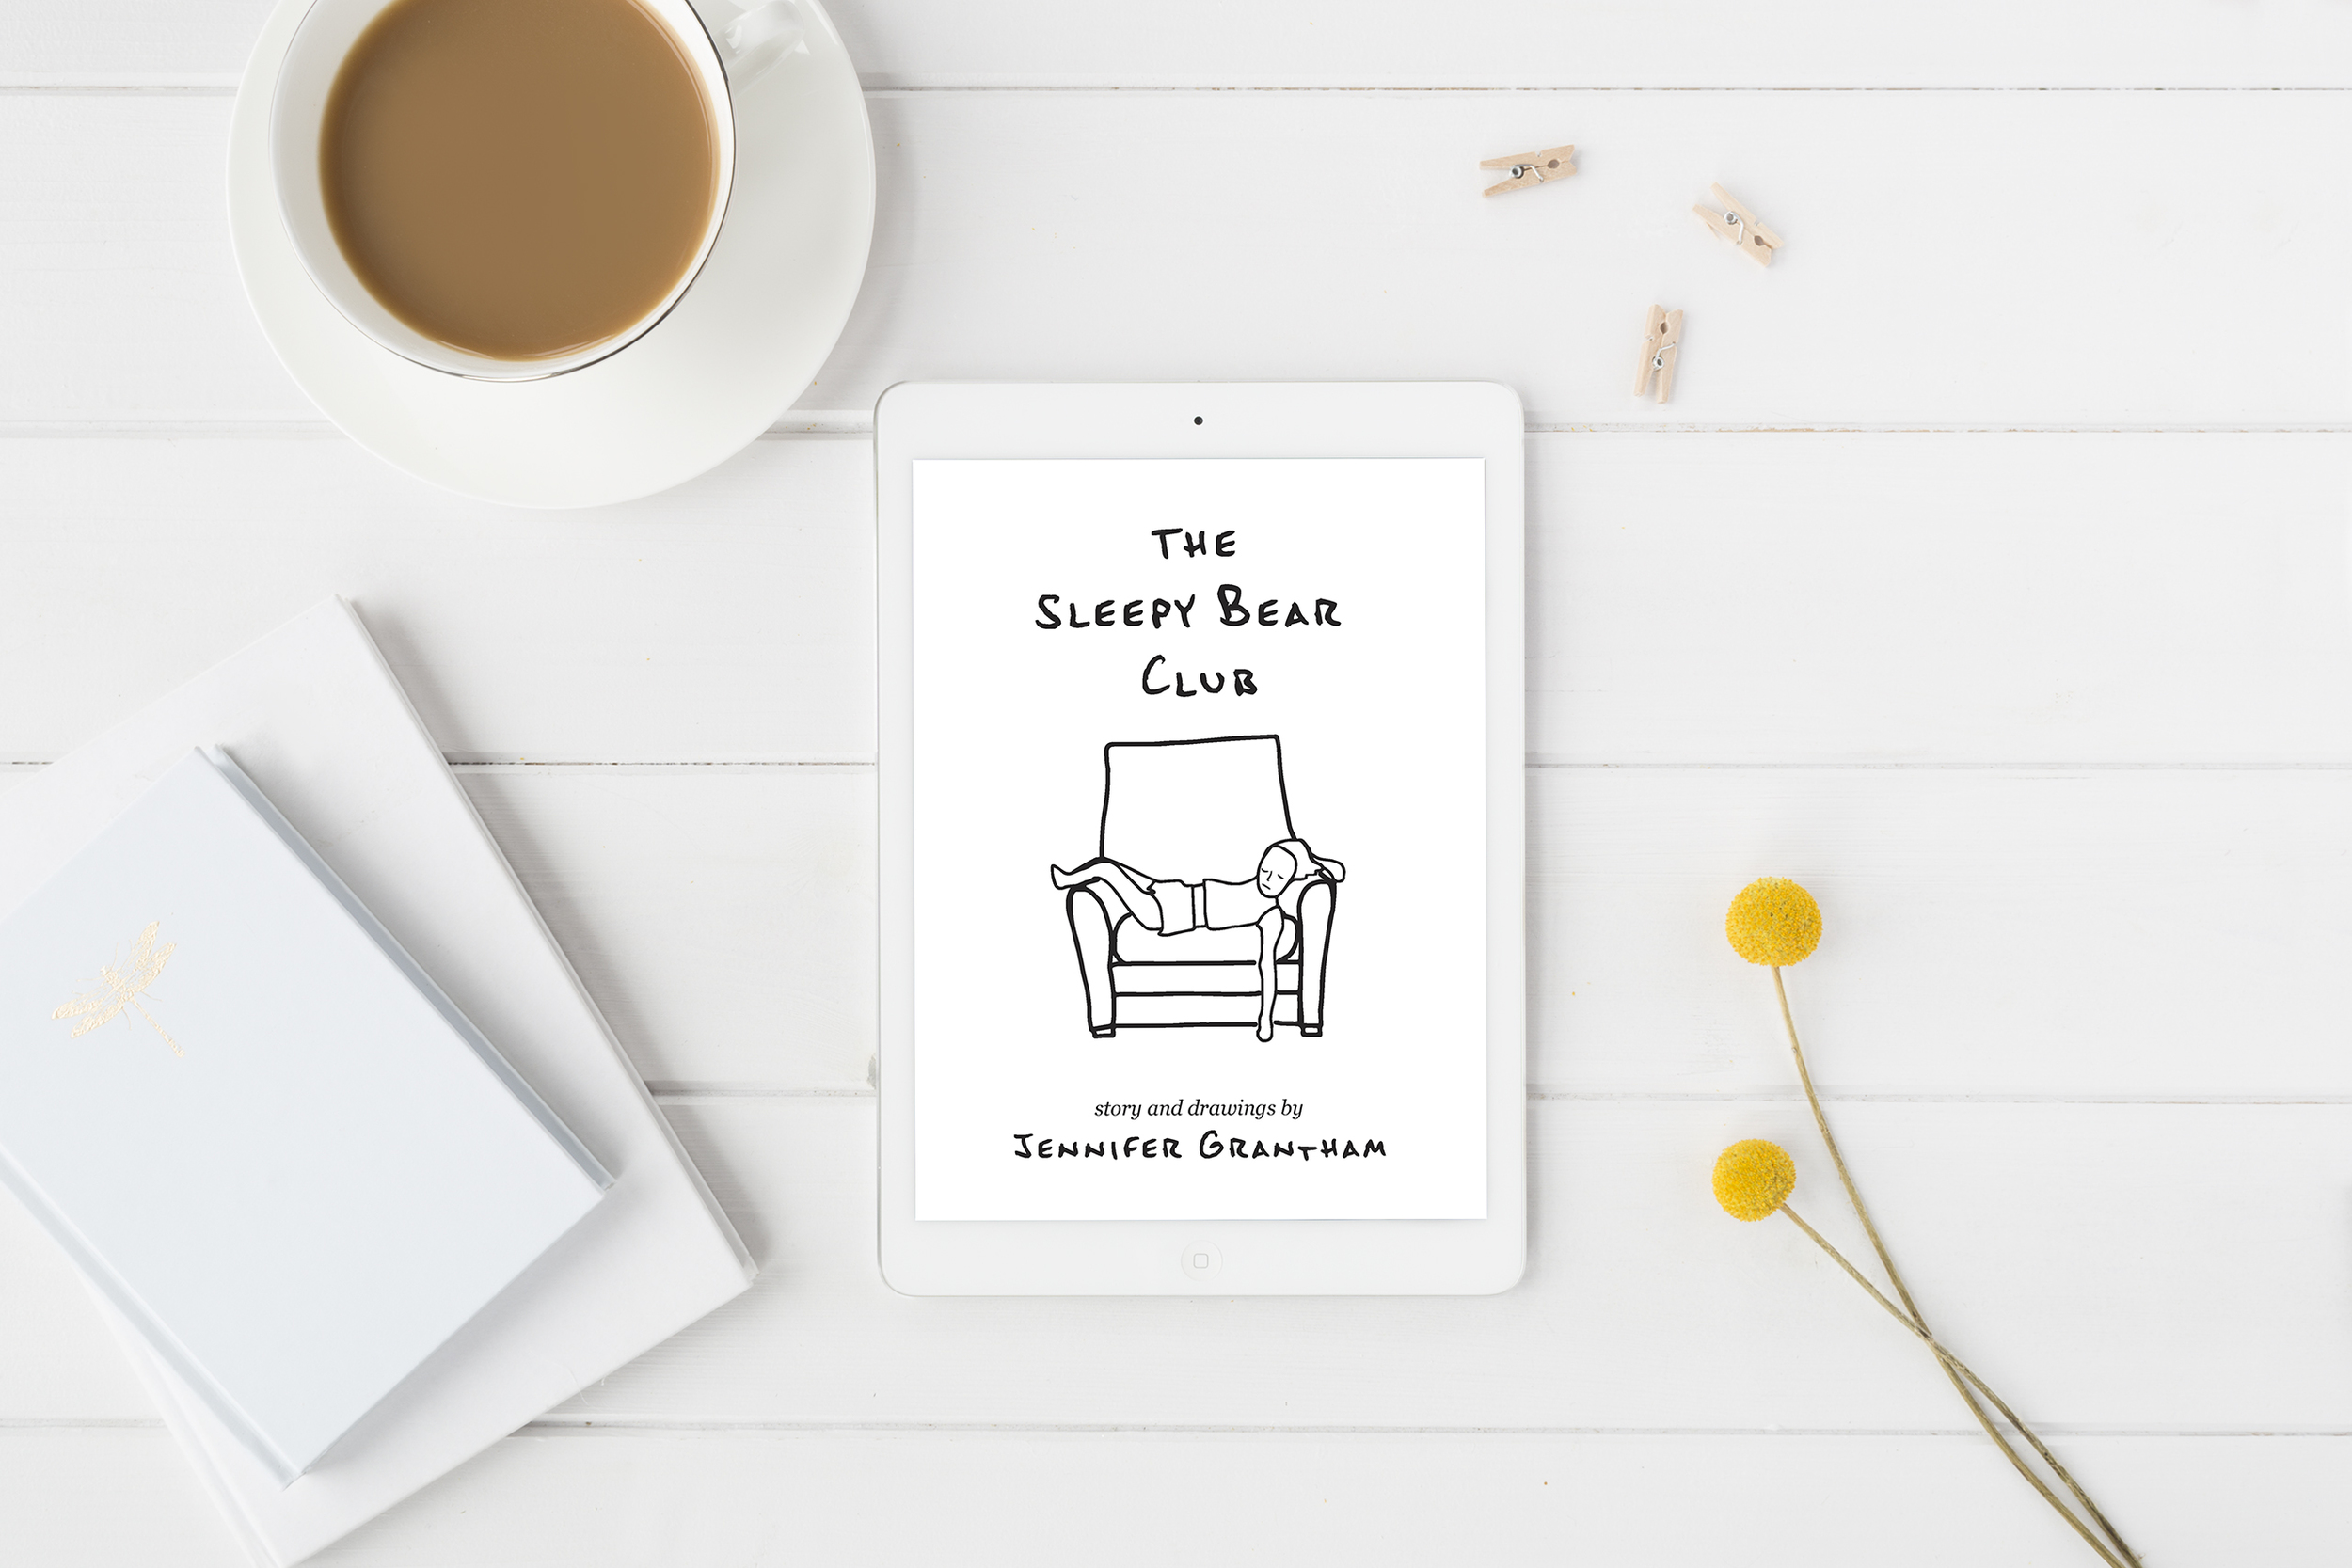 The Sleepy Bear club iBook